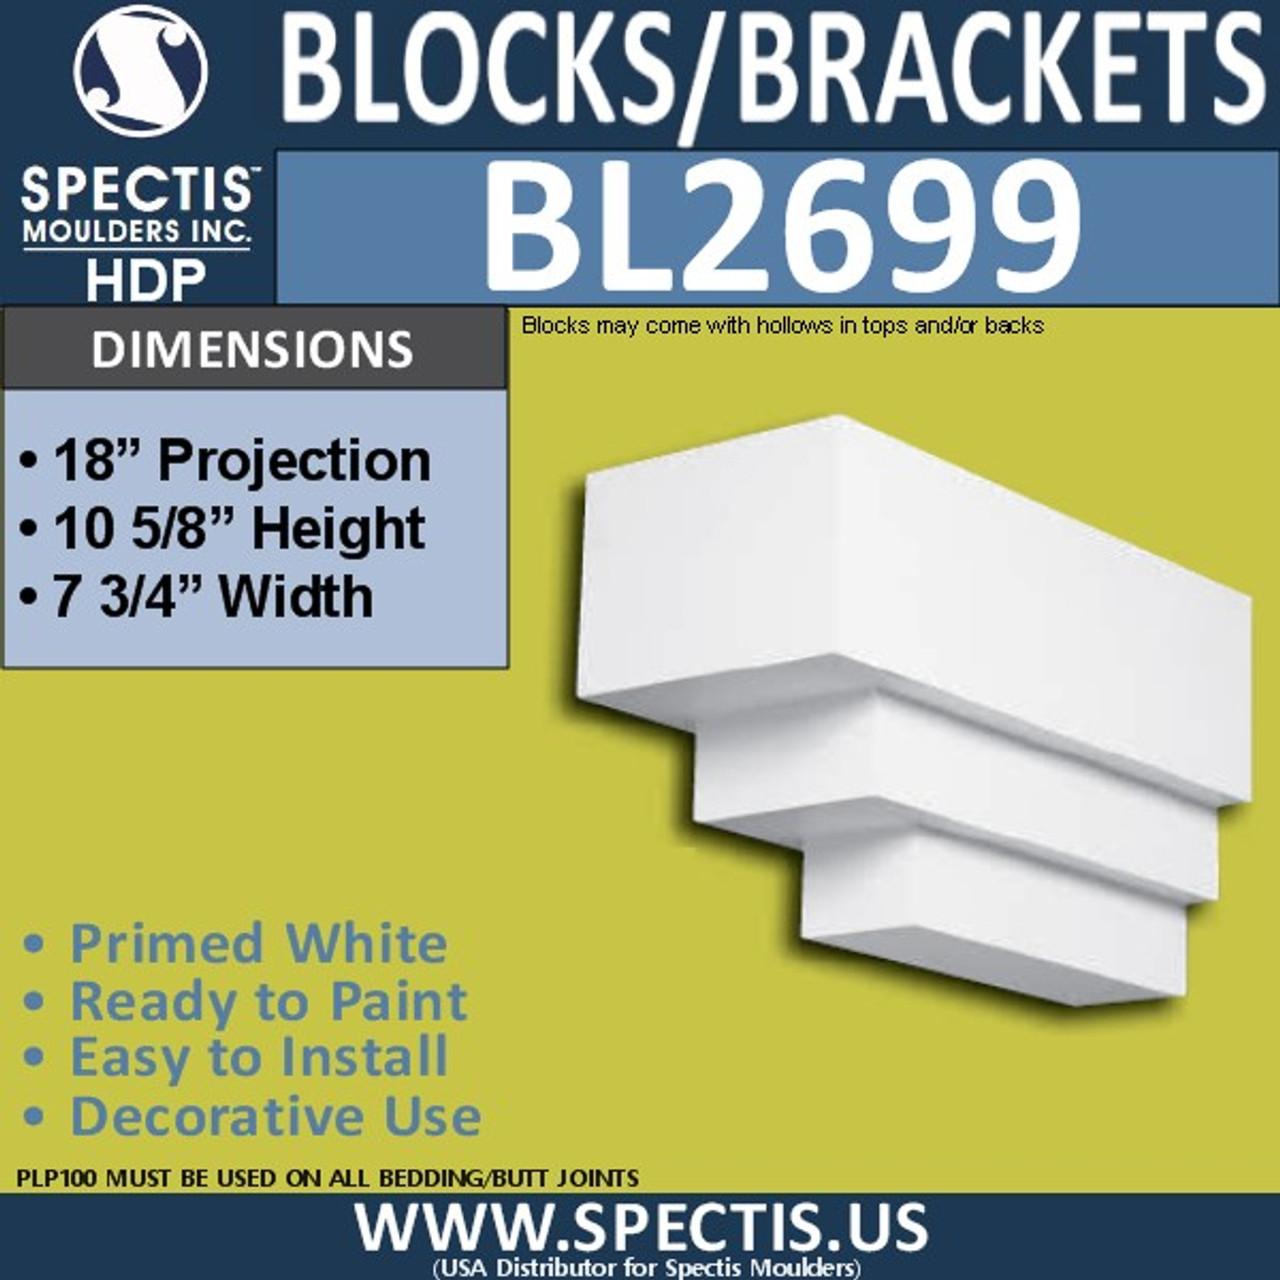 "BL2699 Eave Block or Bracket 7.75""W x 10.5""H x 18"" P"